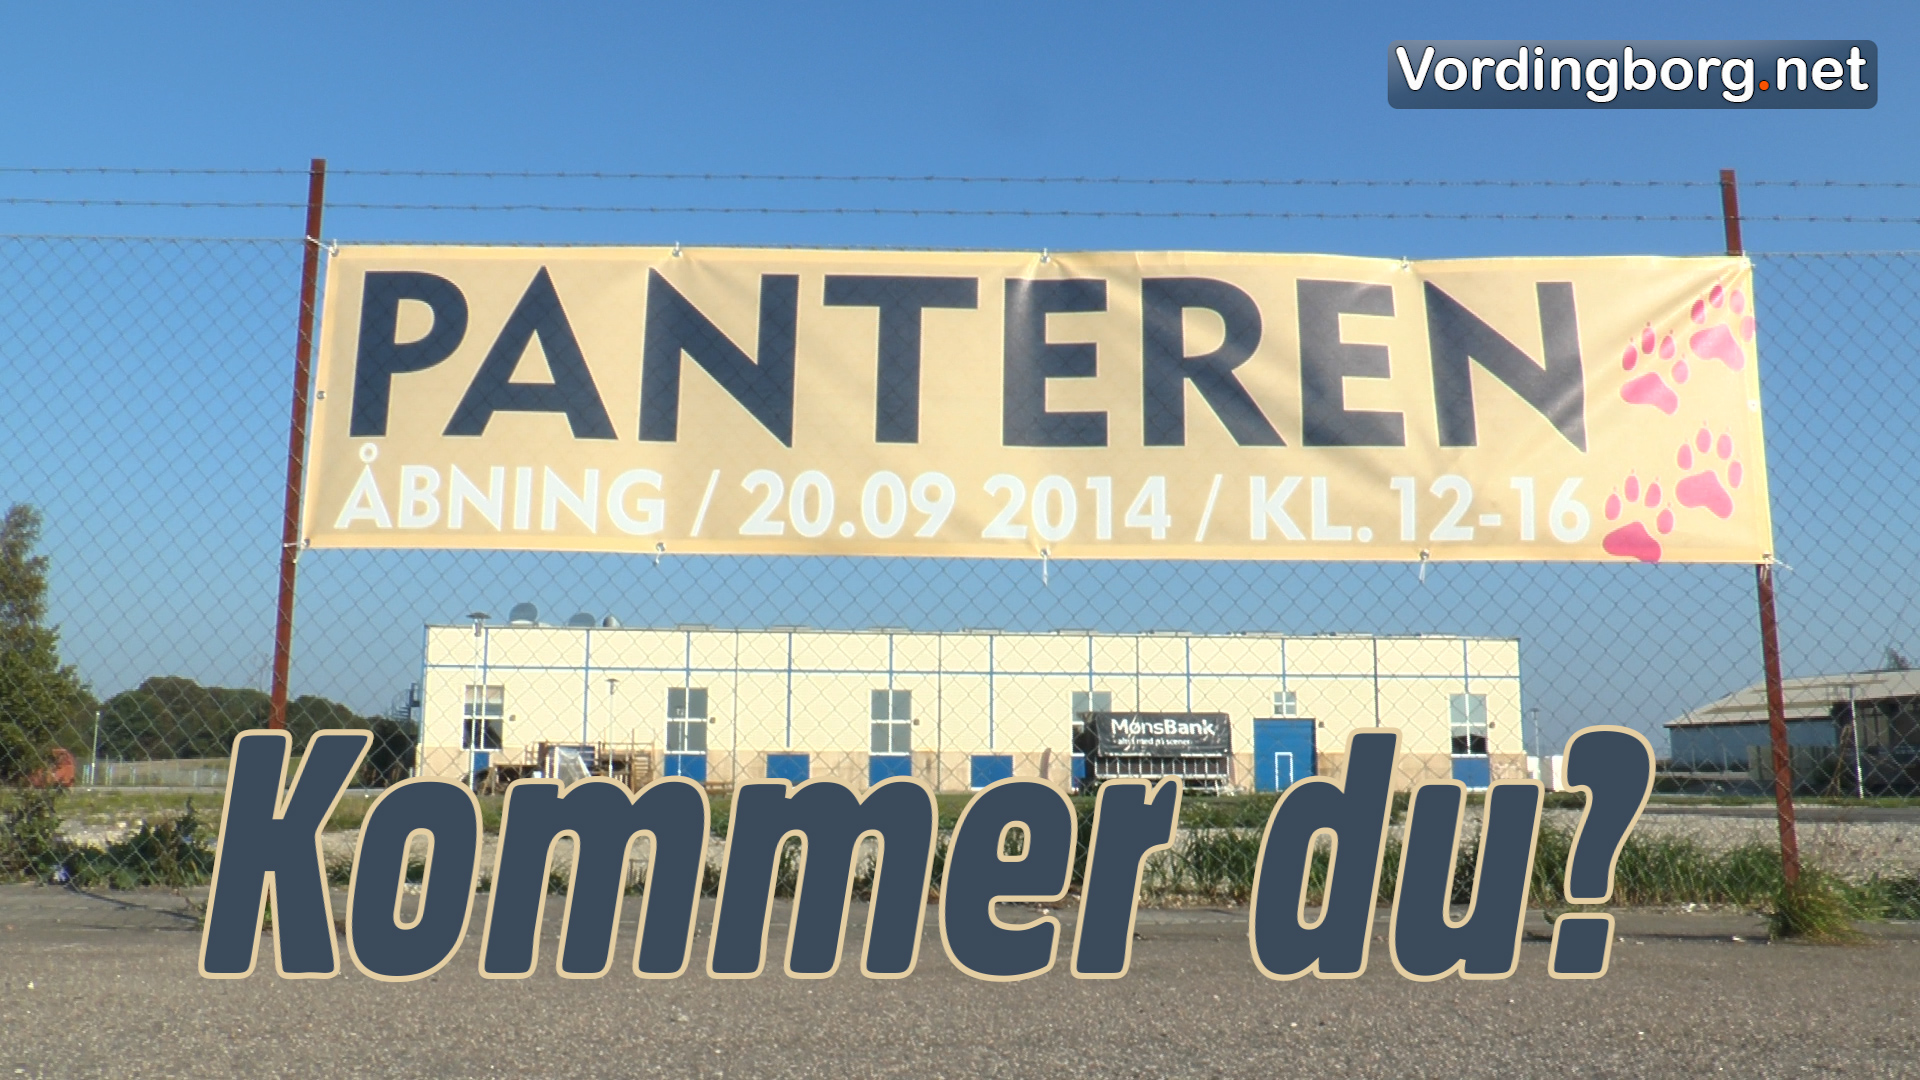 Husk: Det er lørdag Panteren åbner